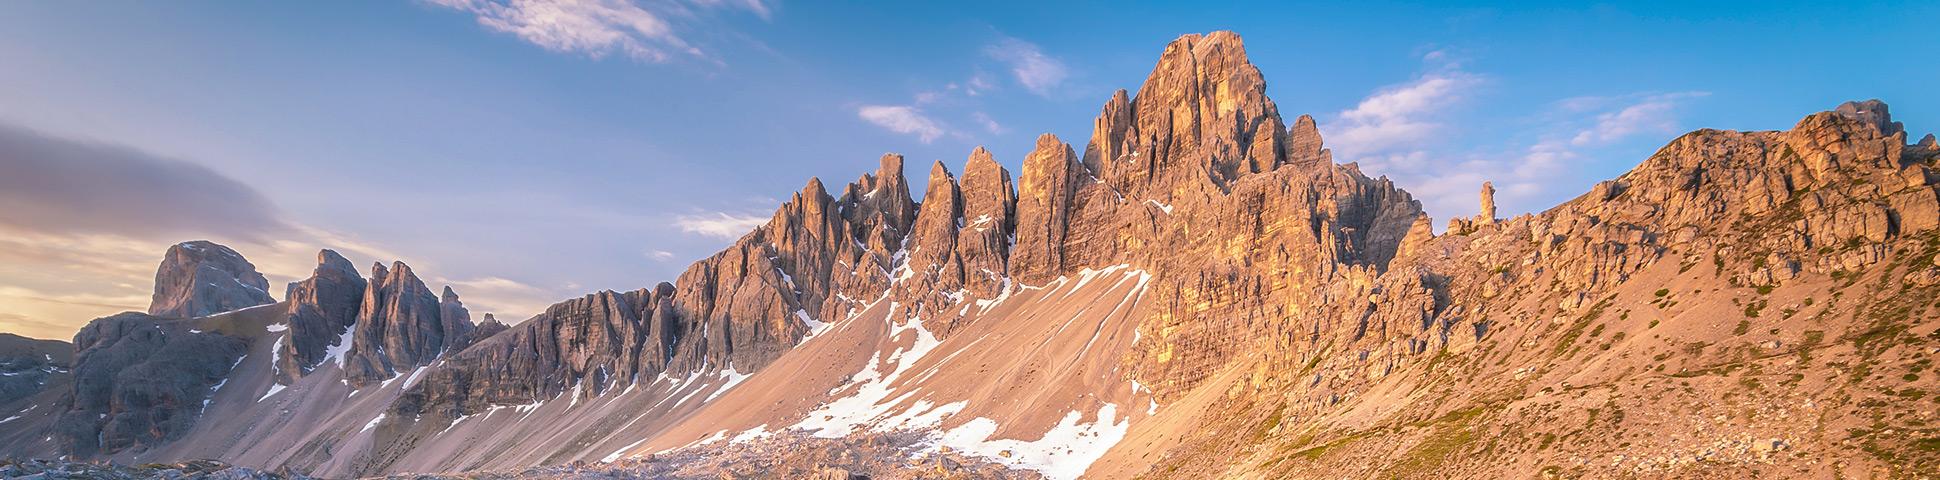 Beautiful panoramic views from Hut to Hut Trekking Tour in the Dolomites